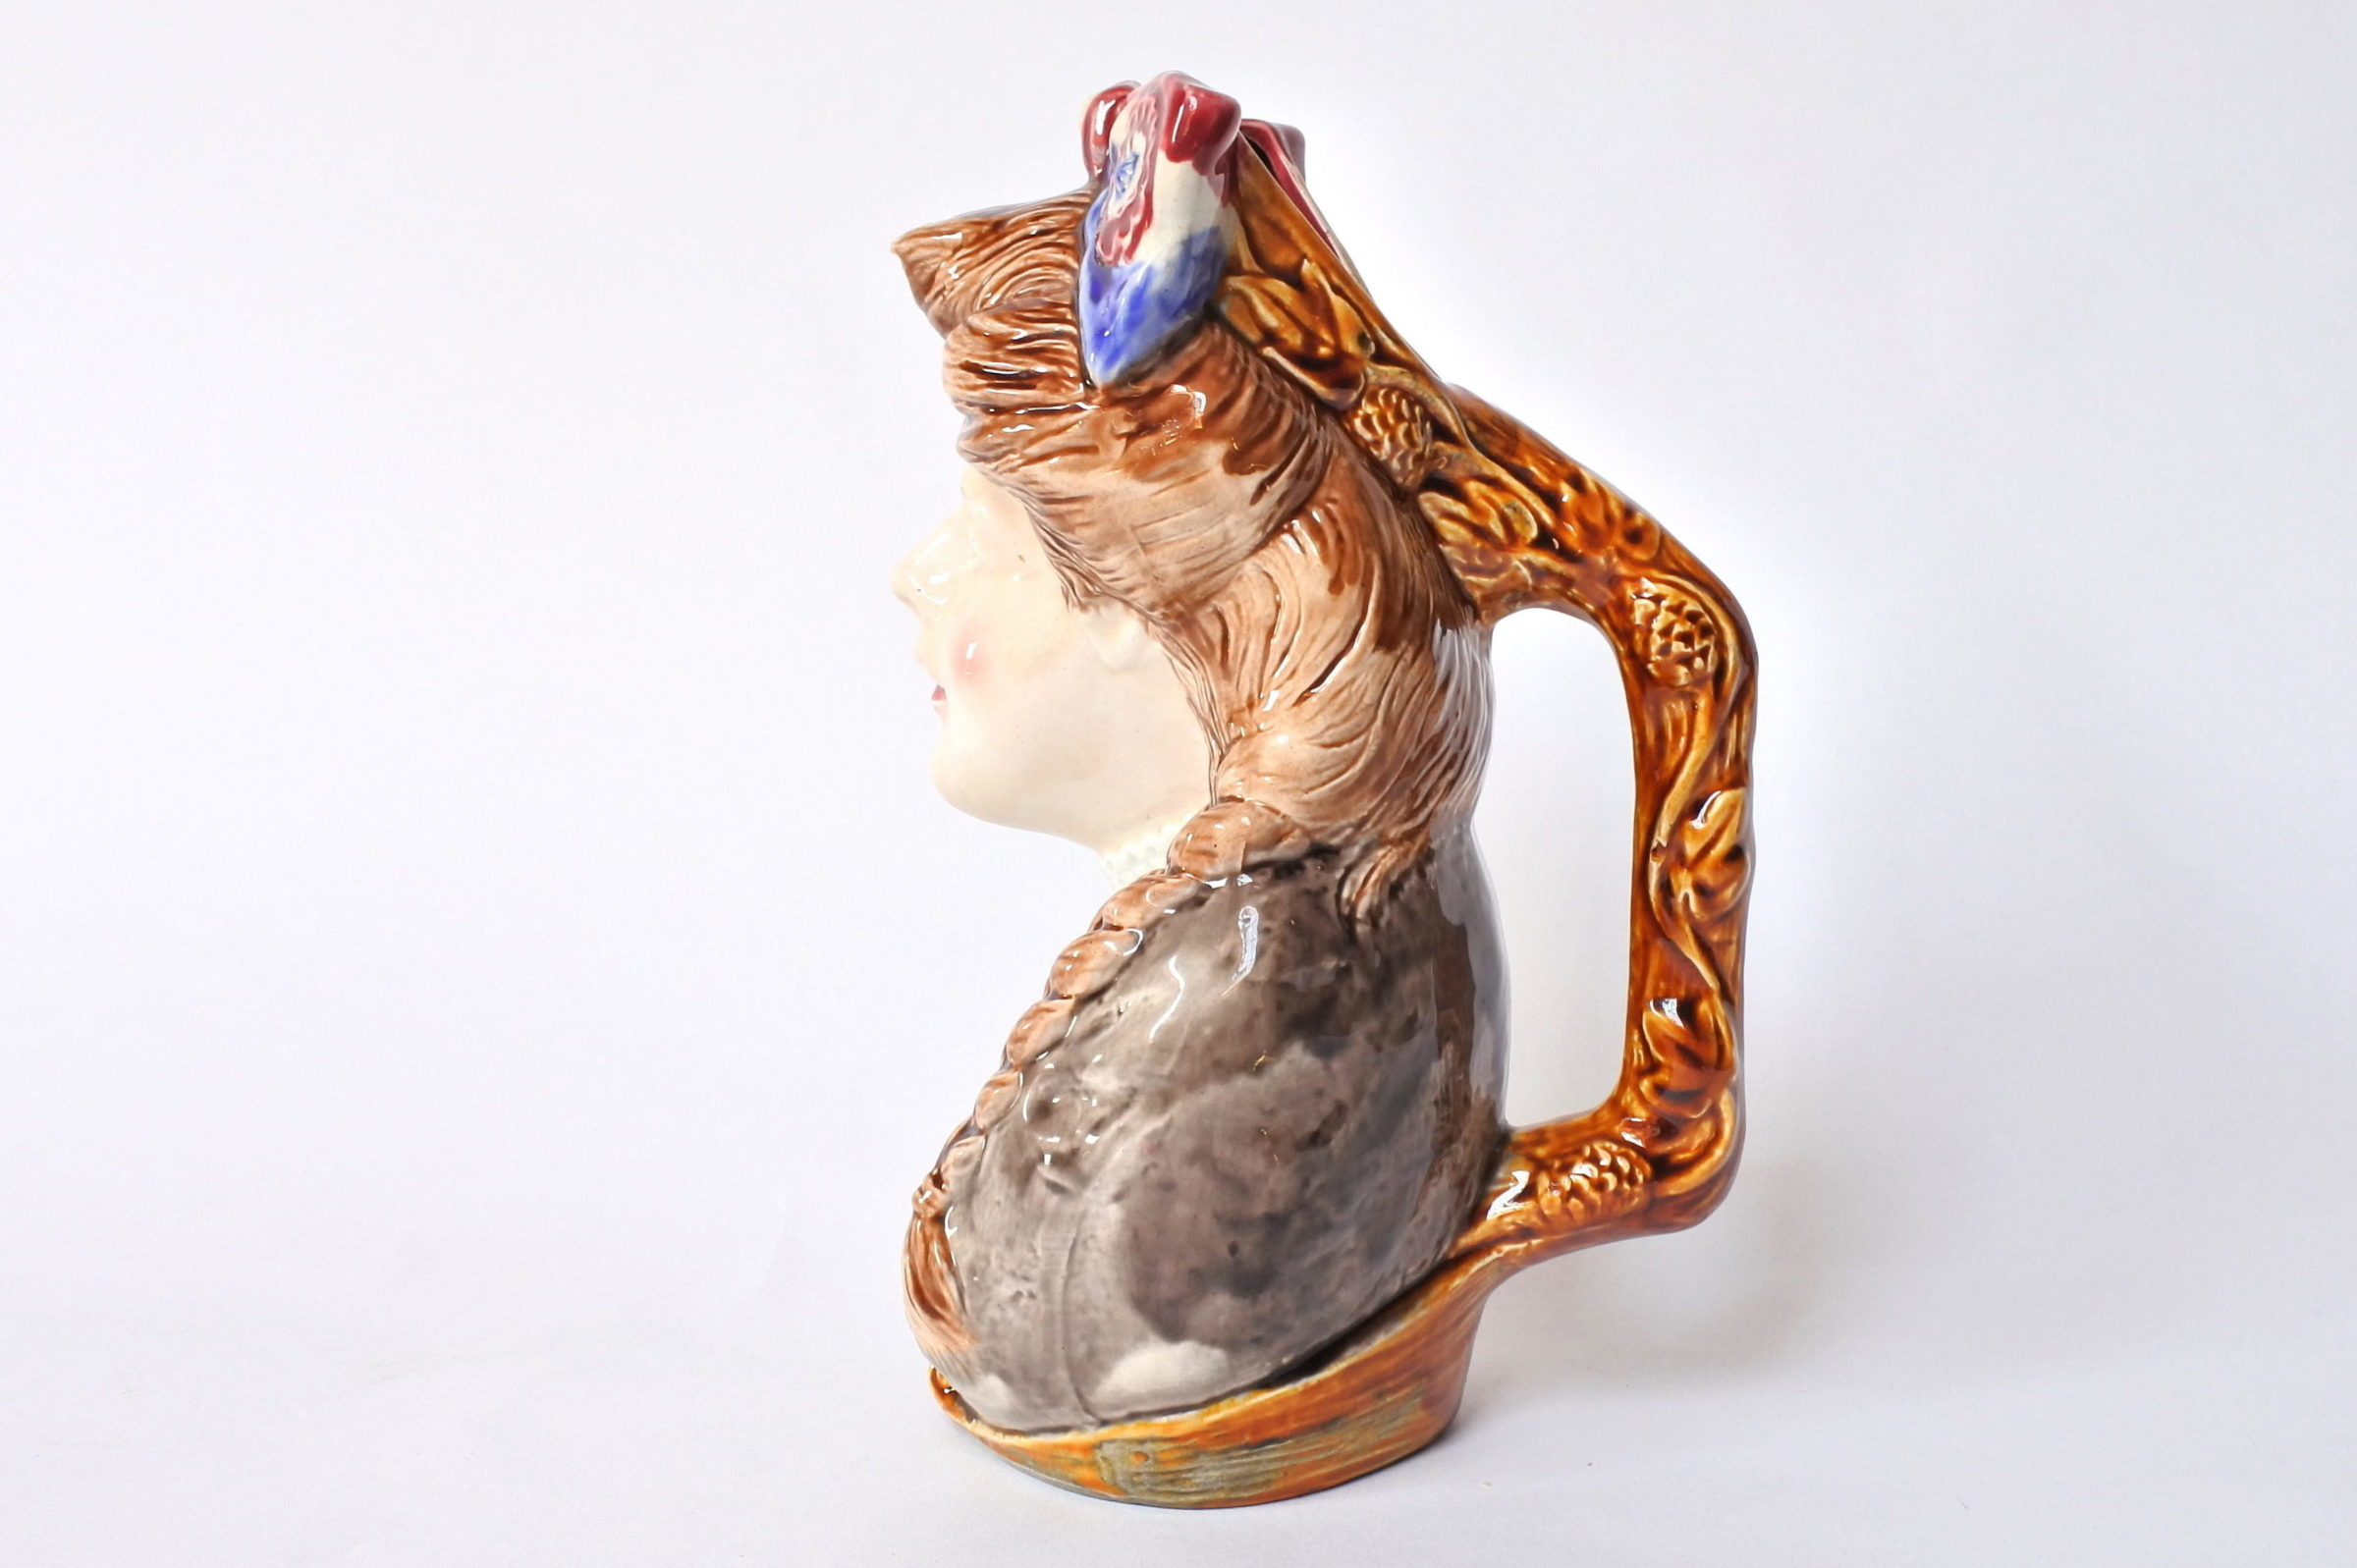 Brocca in ceramica barbotine a forma di volto donna - Onnaing n° 808 - 2